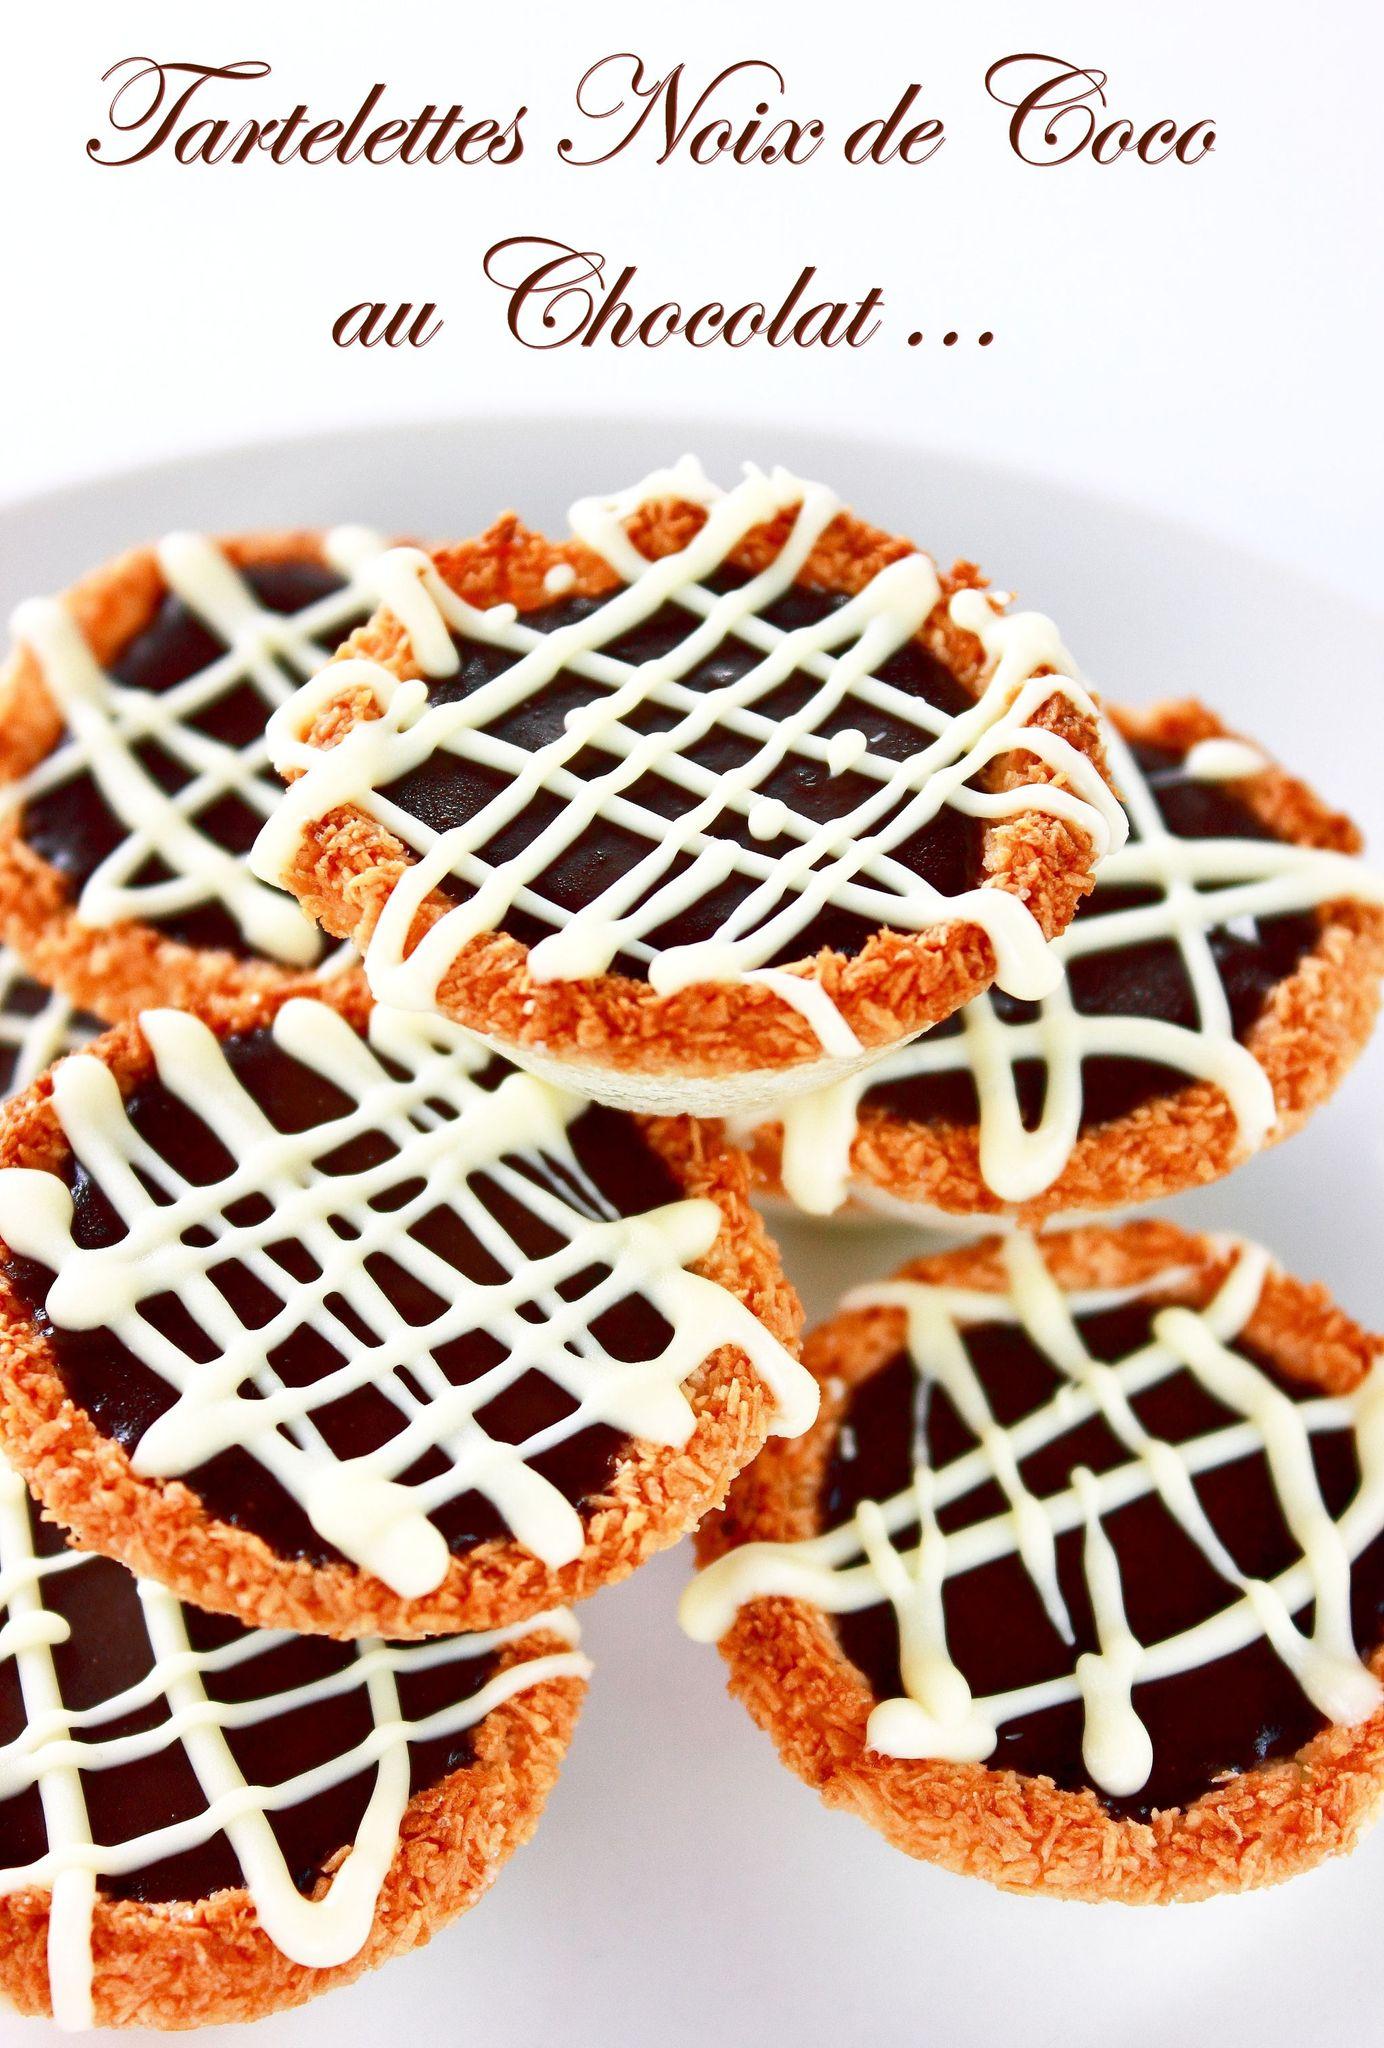 Mini-Tartelettes noix de coco & chocolate